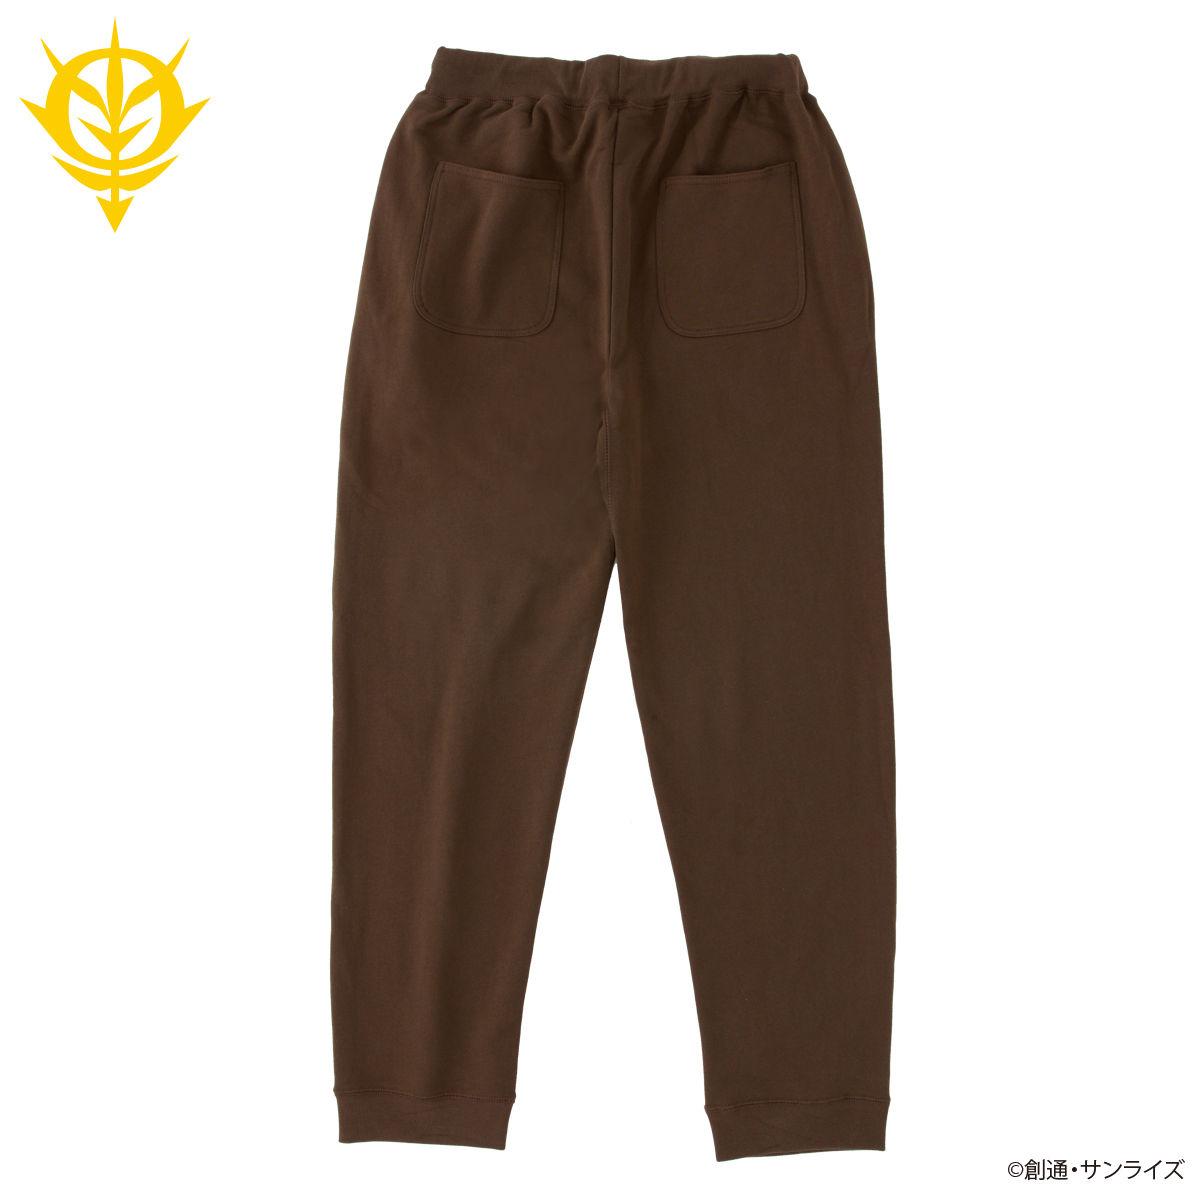 Mobile Suit Gundam Zeon Workout Pants